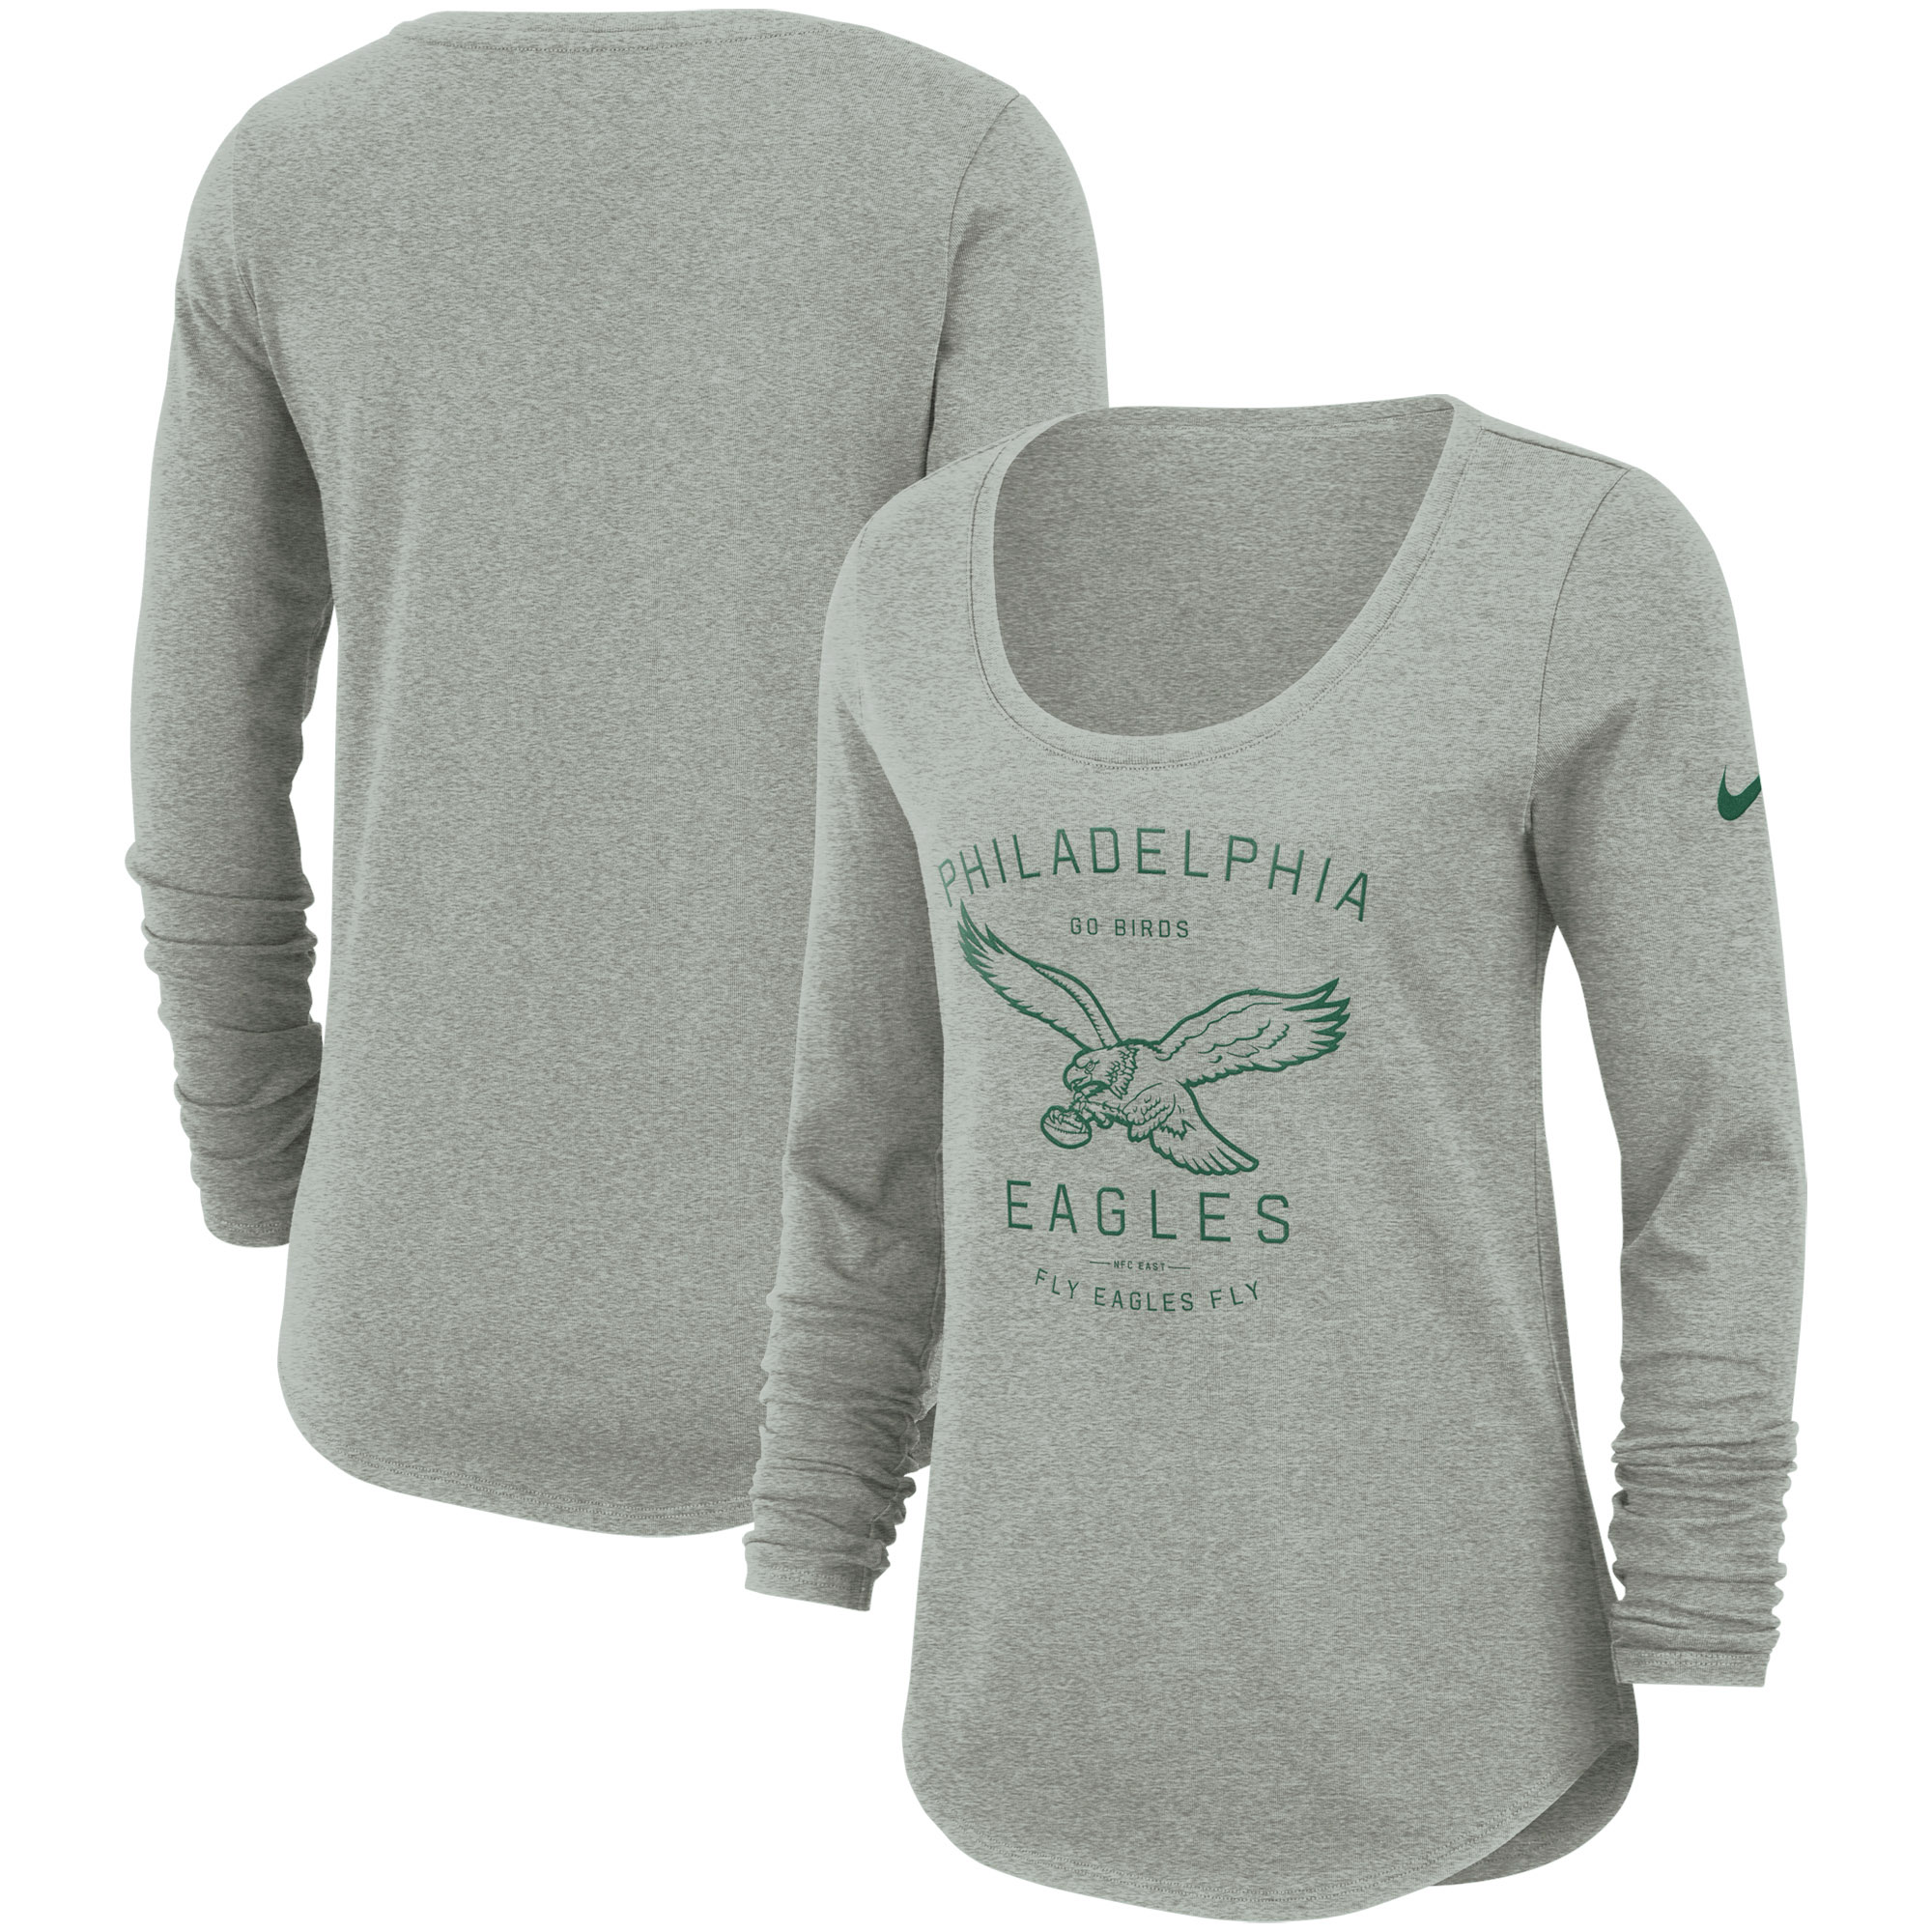 Philadelphia Eagles Nike Women's Team Slogan Long Sleeve T-Shirt - Dark Gray